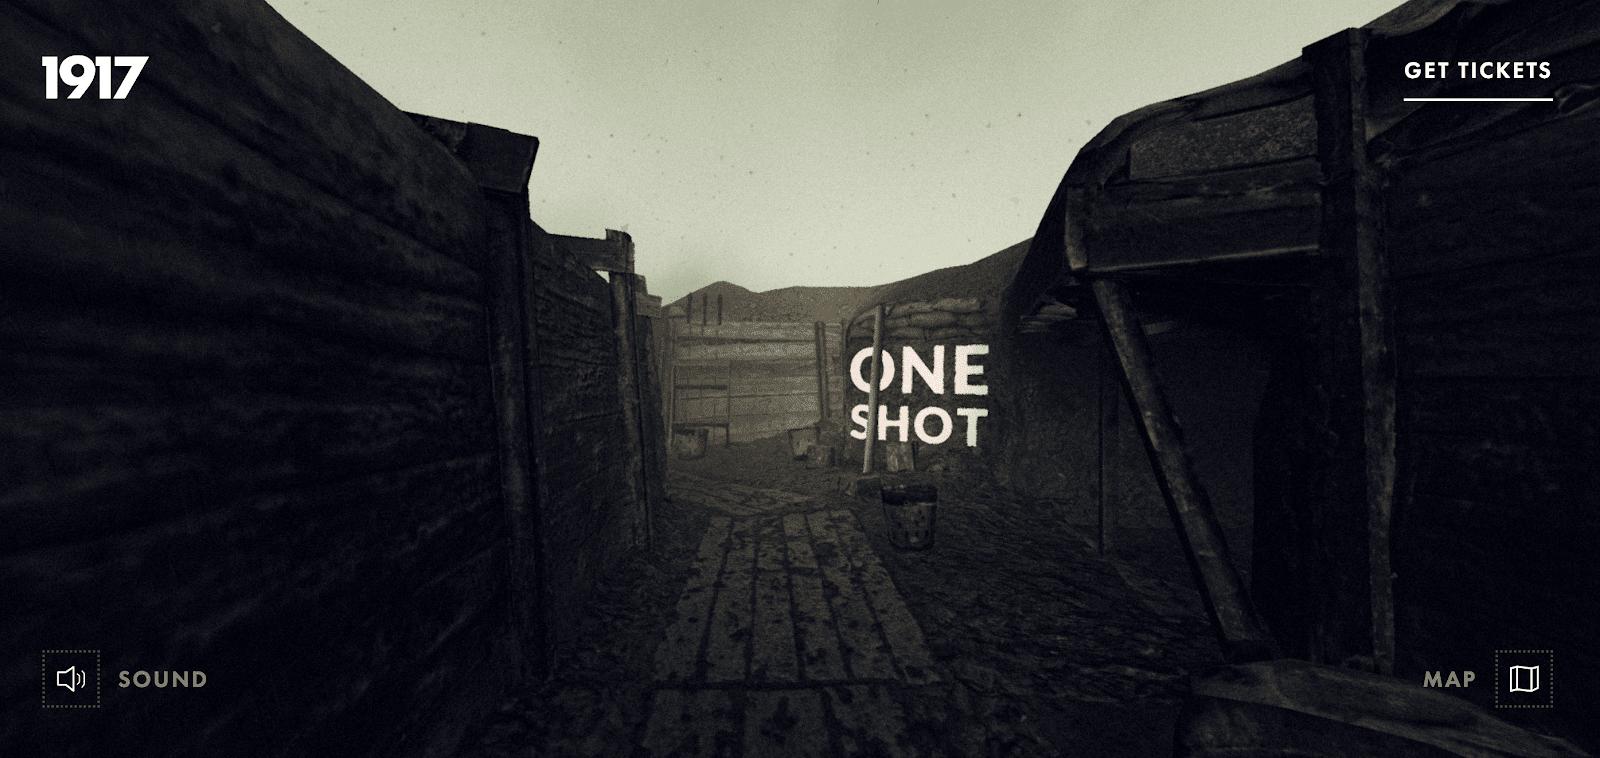 1917: In the trenches best website design award winner 2019